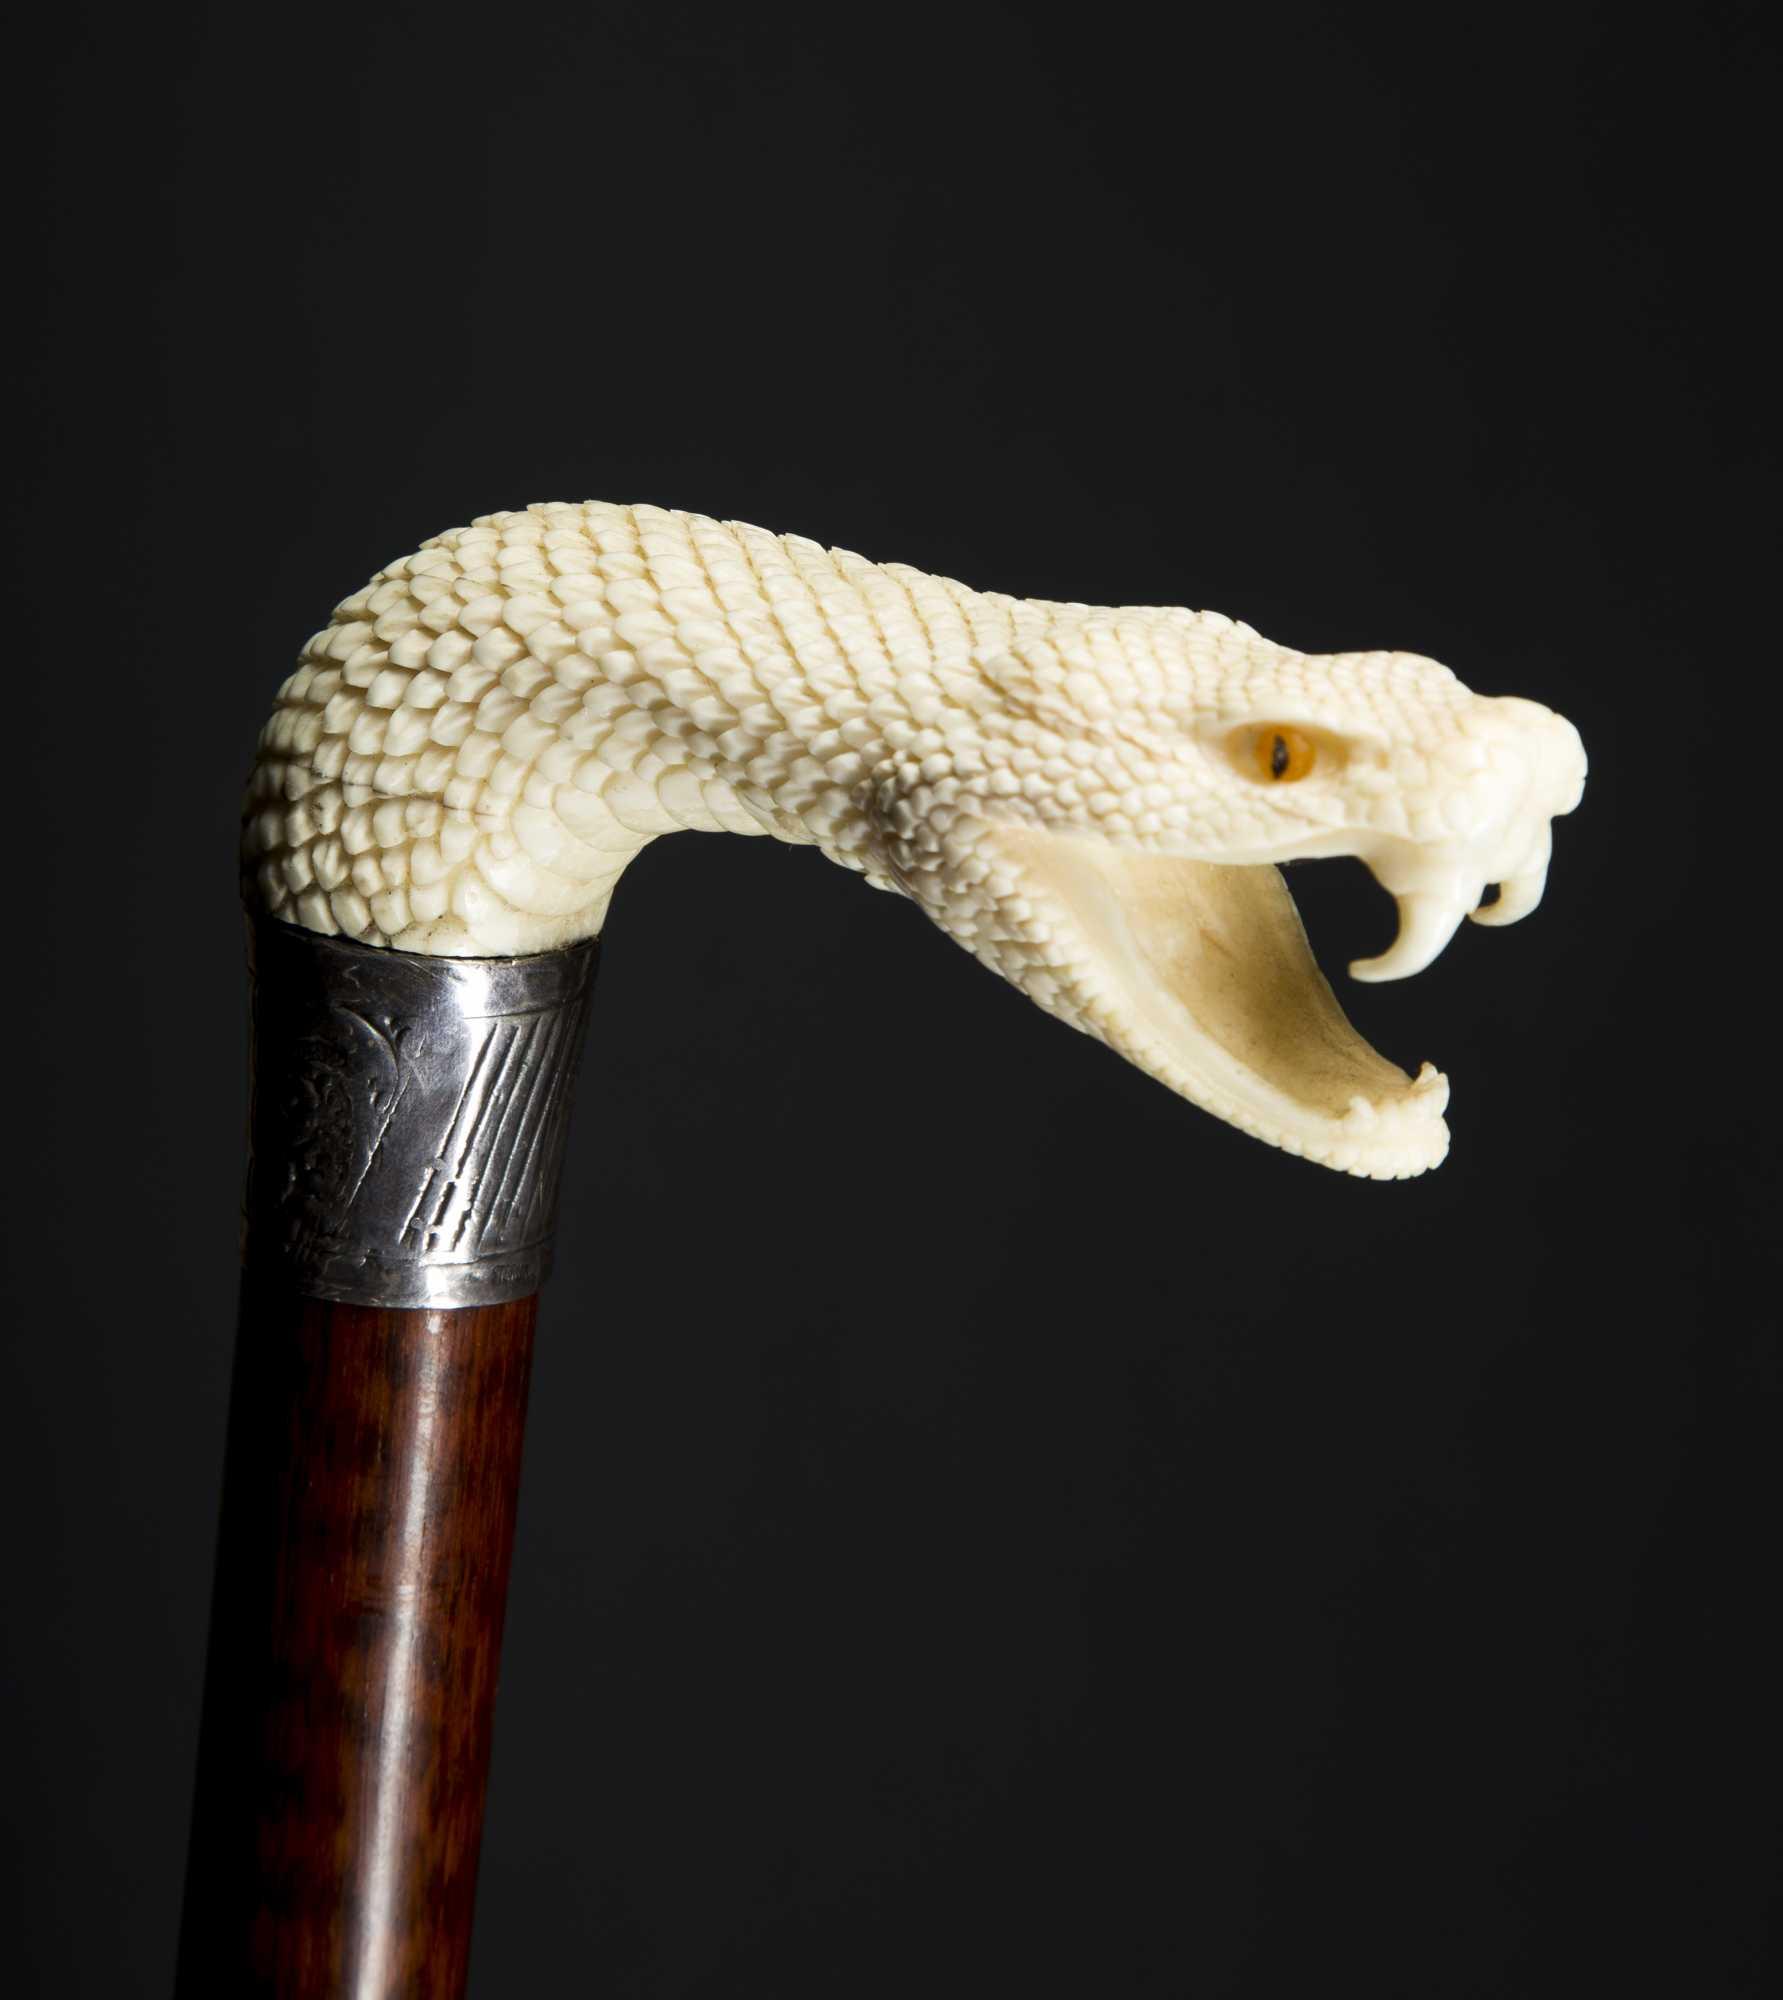 Carved snake head cane